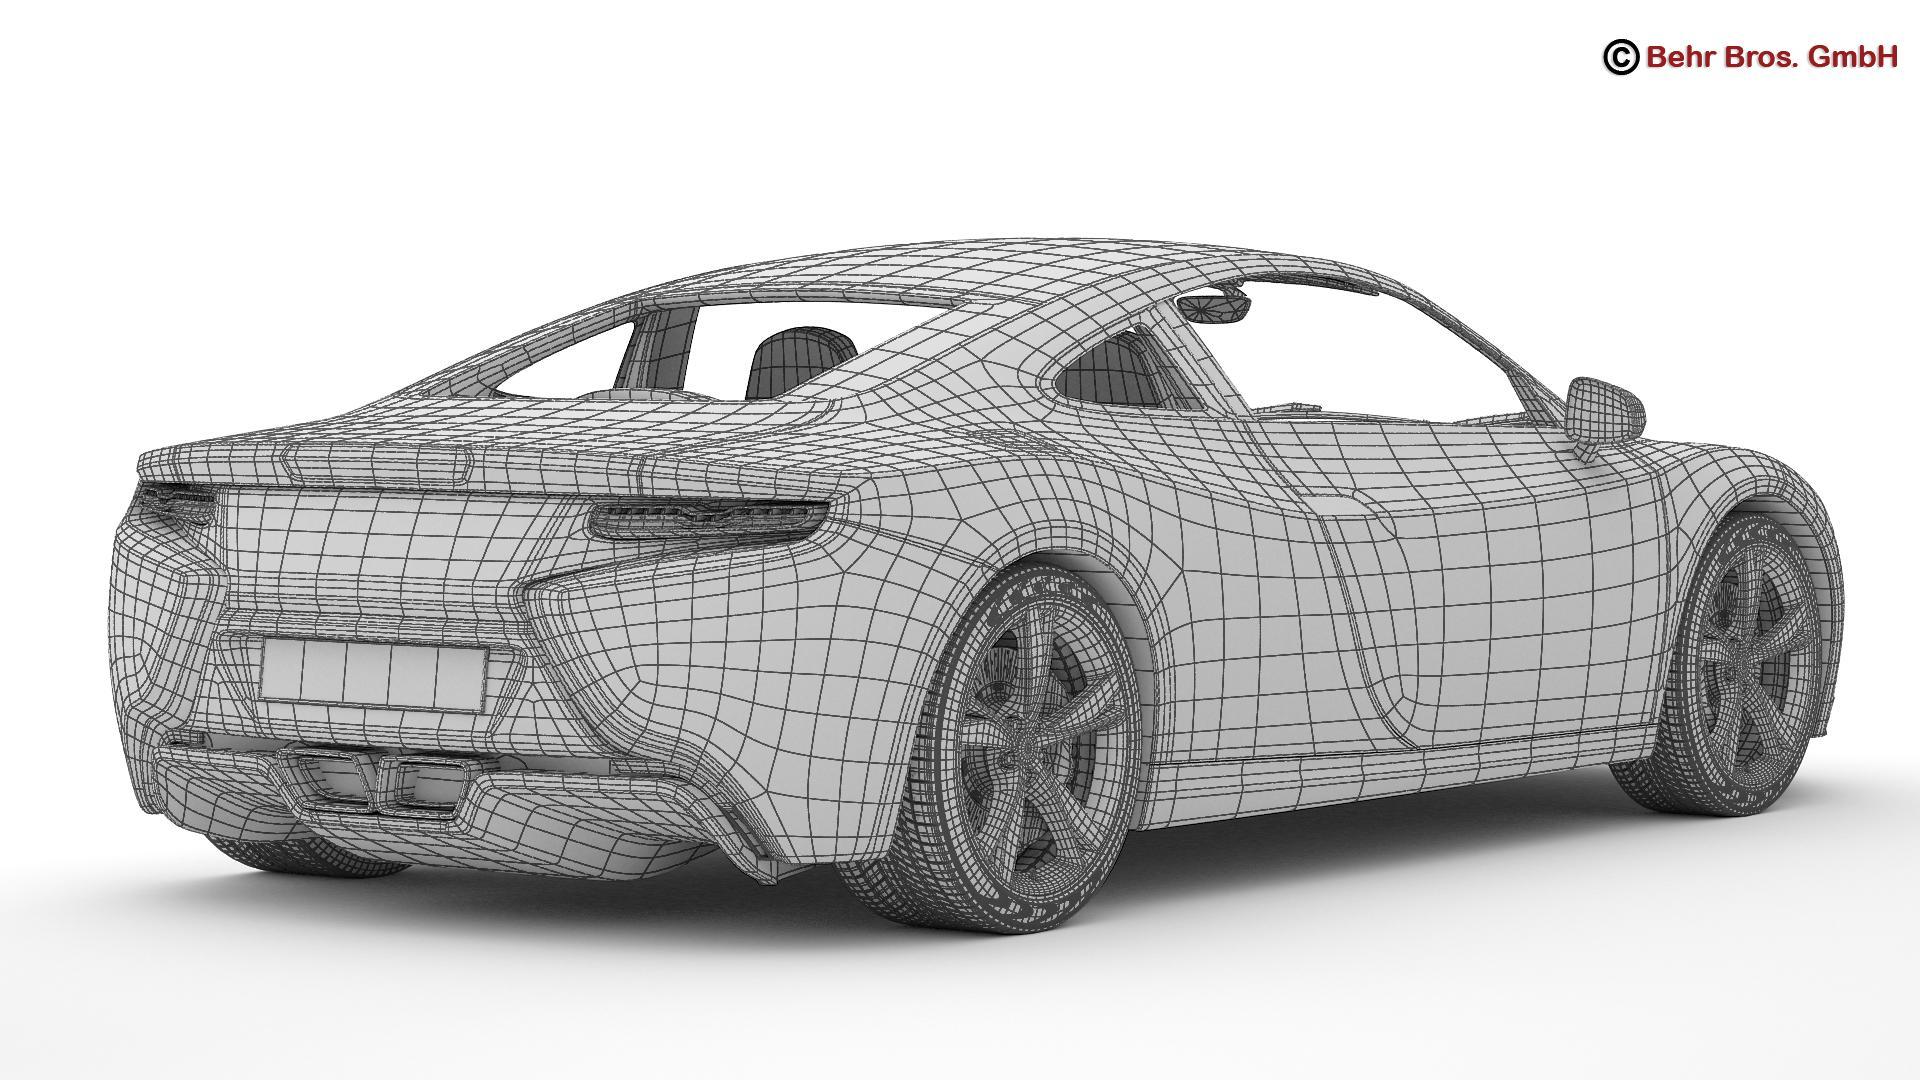 generic sports car 3d model 3ds max fbx c4d lwo ma mb obj 160537